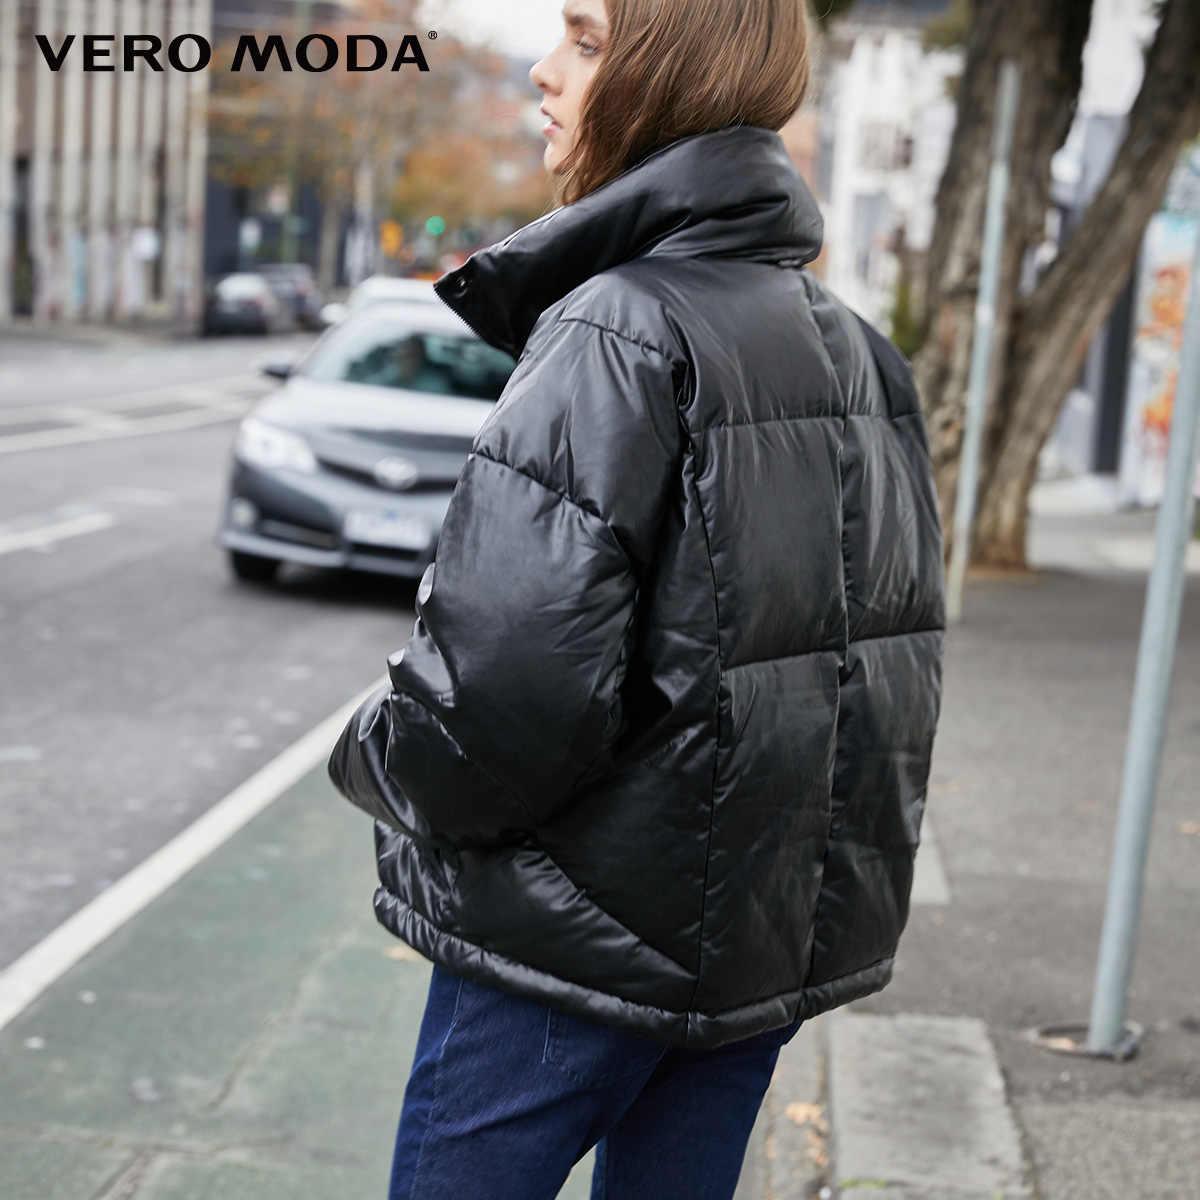 Vero Moda New Women's PU Fabric Orange Stand-up Collar Down Jacket | 319423516